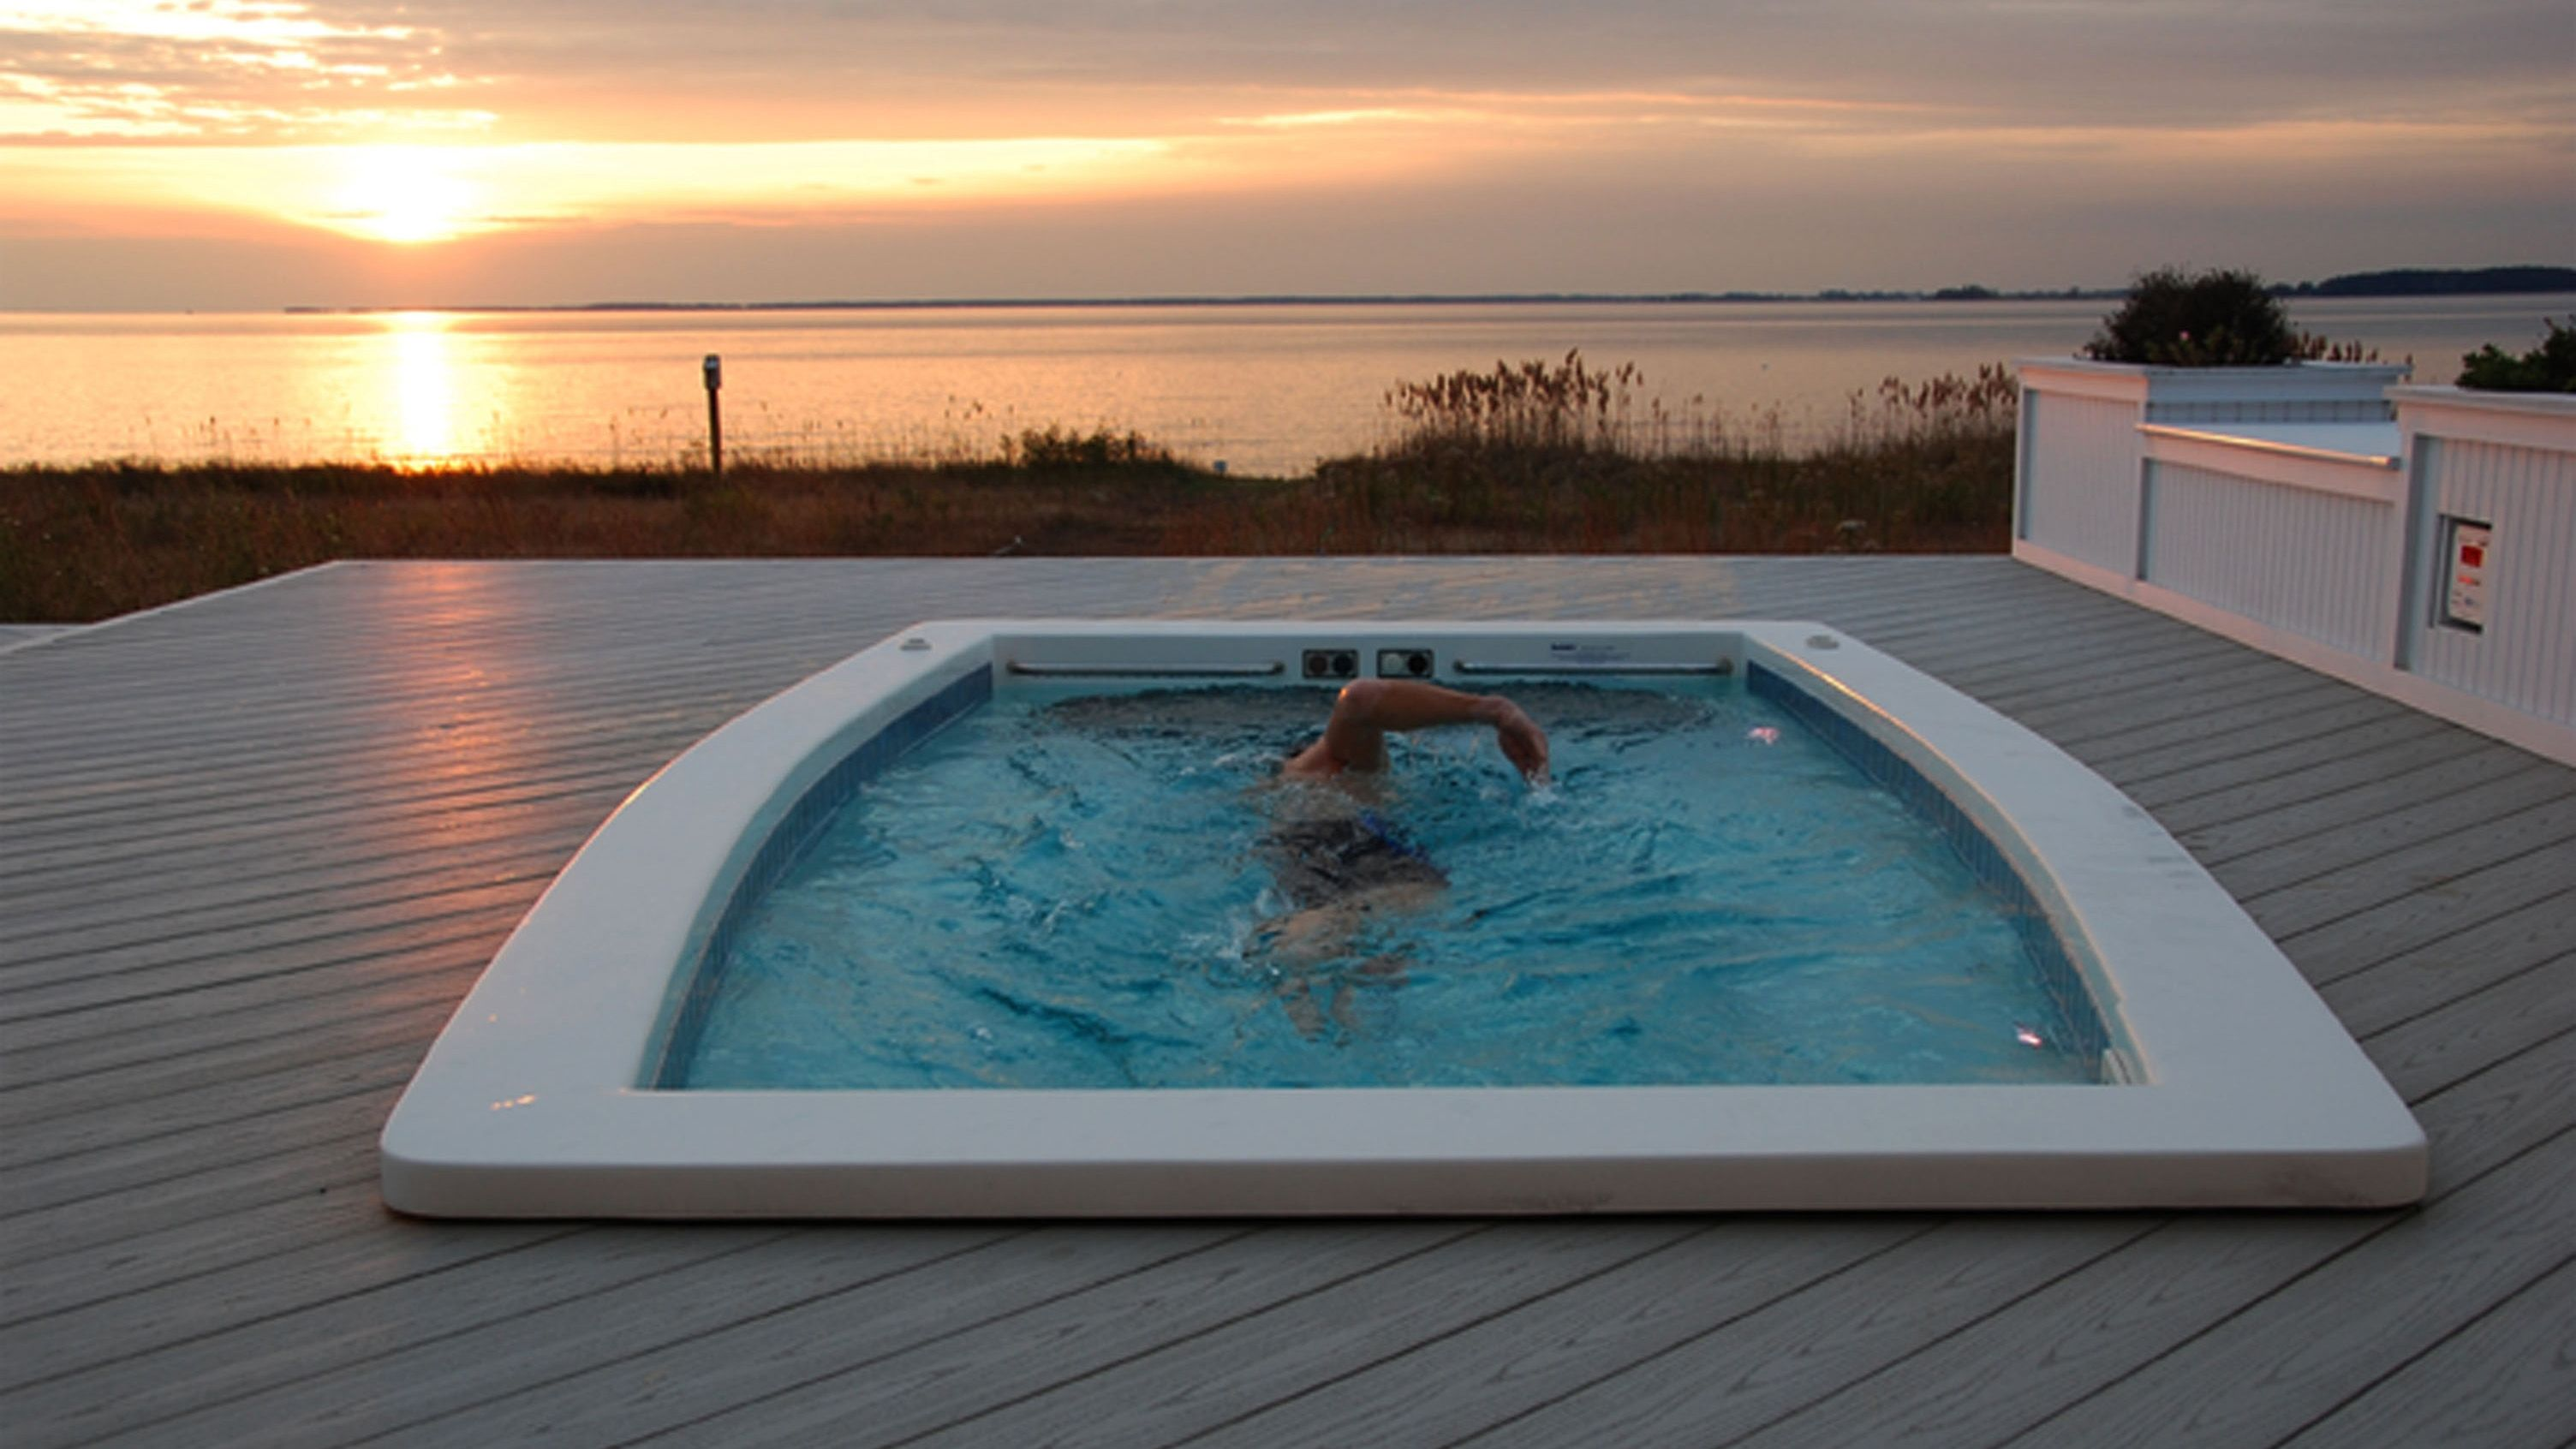 Best Swim Spas 2020 Space Saving Home Pools At Every Price